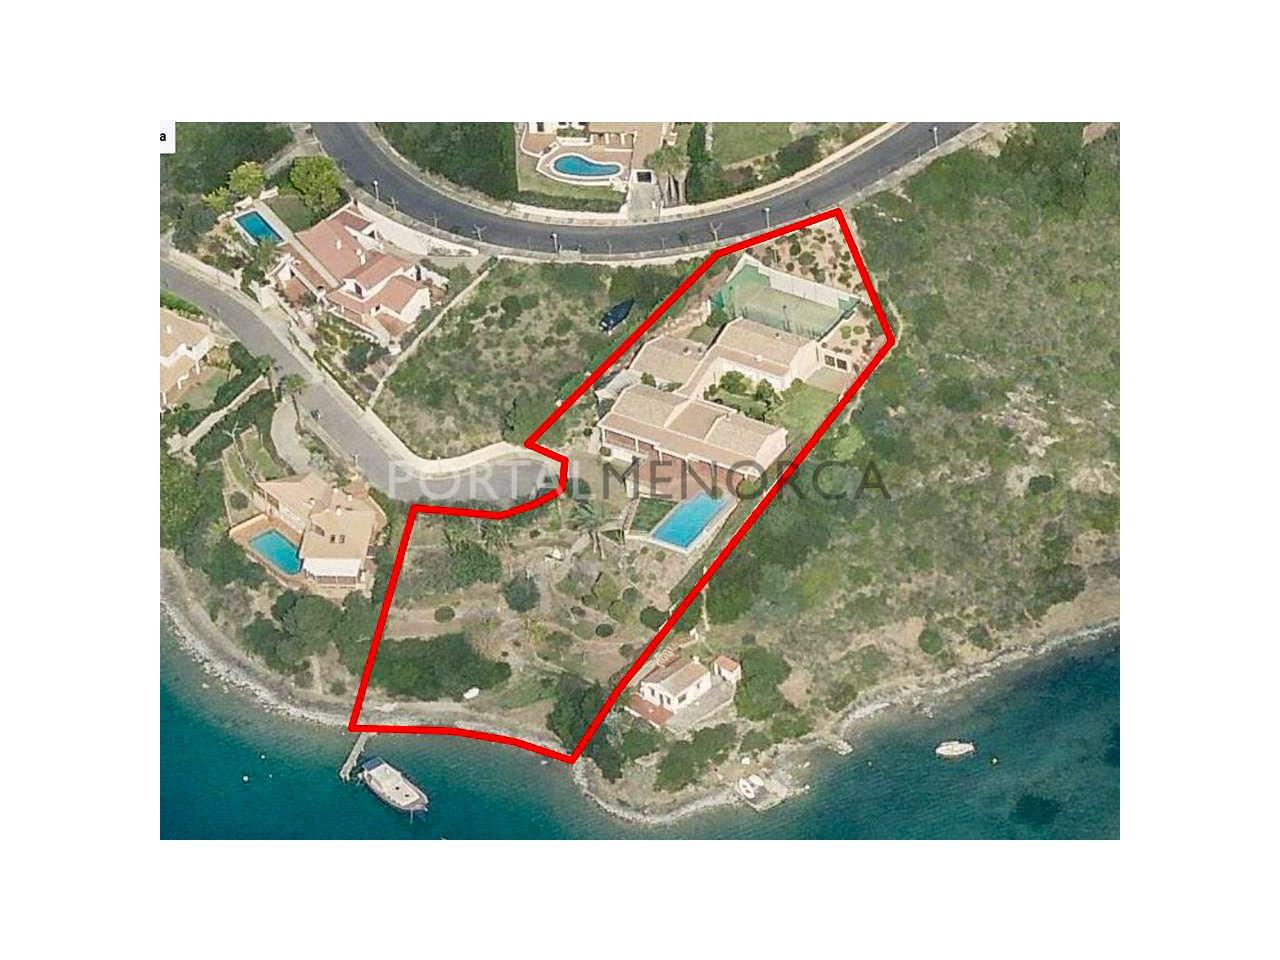 acheter-maison-port-mahon-menorca-minorque (3)